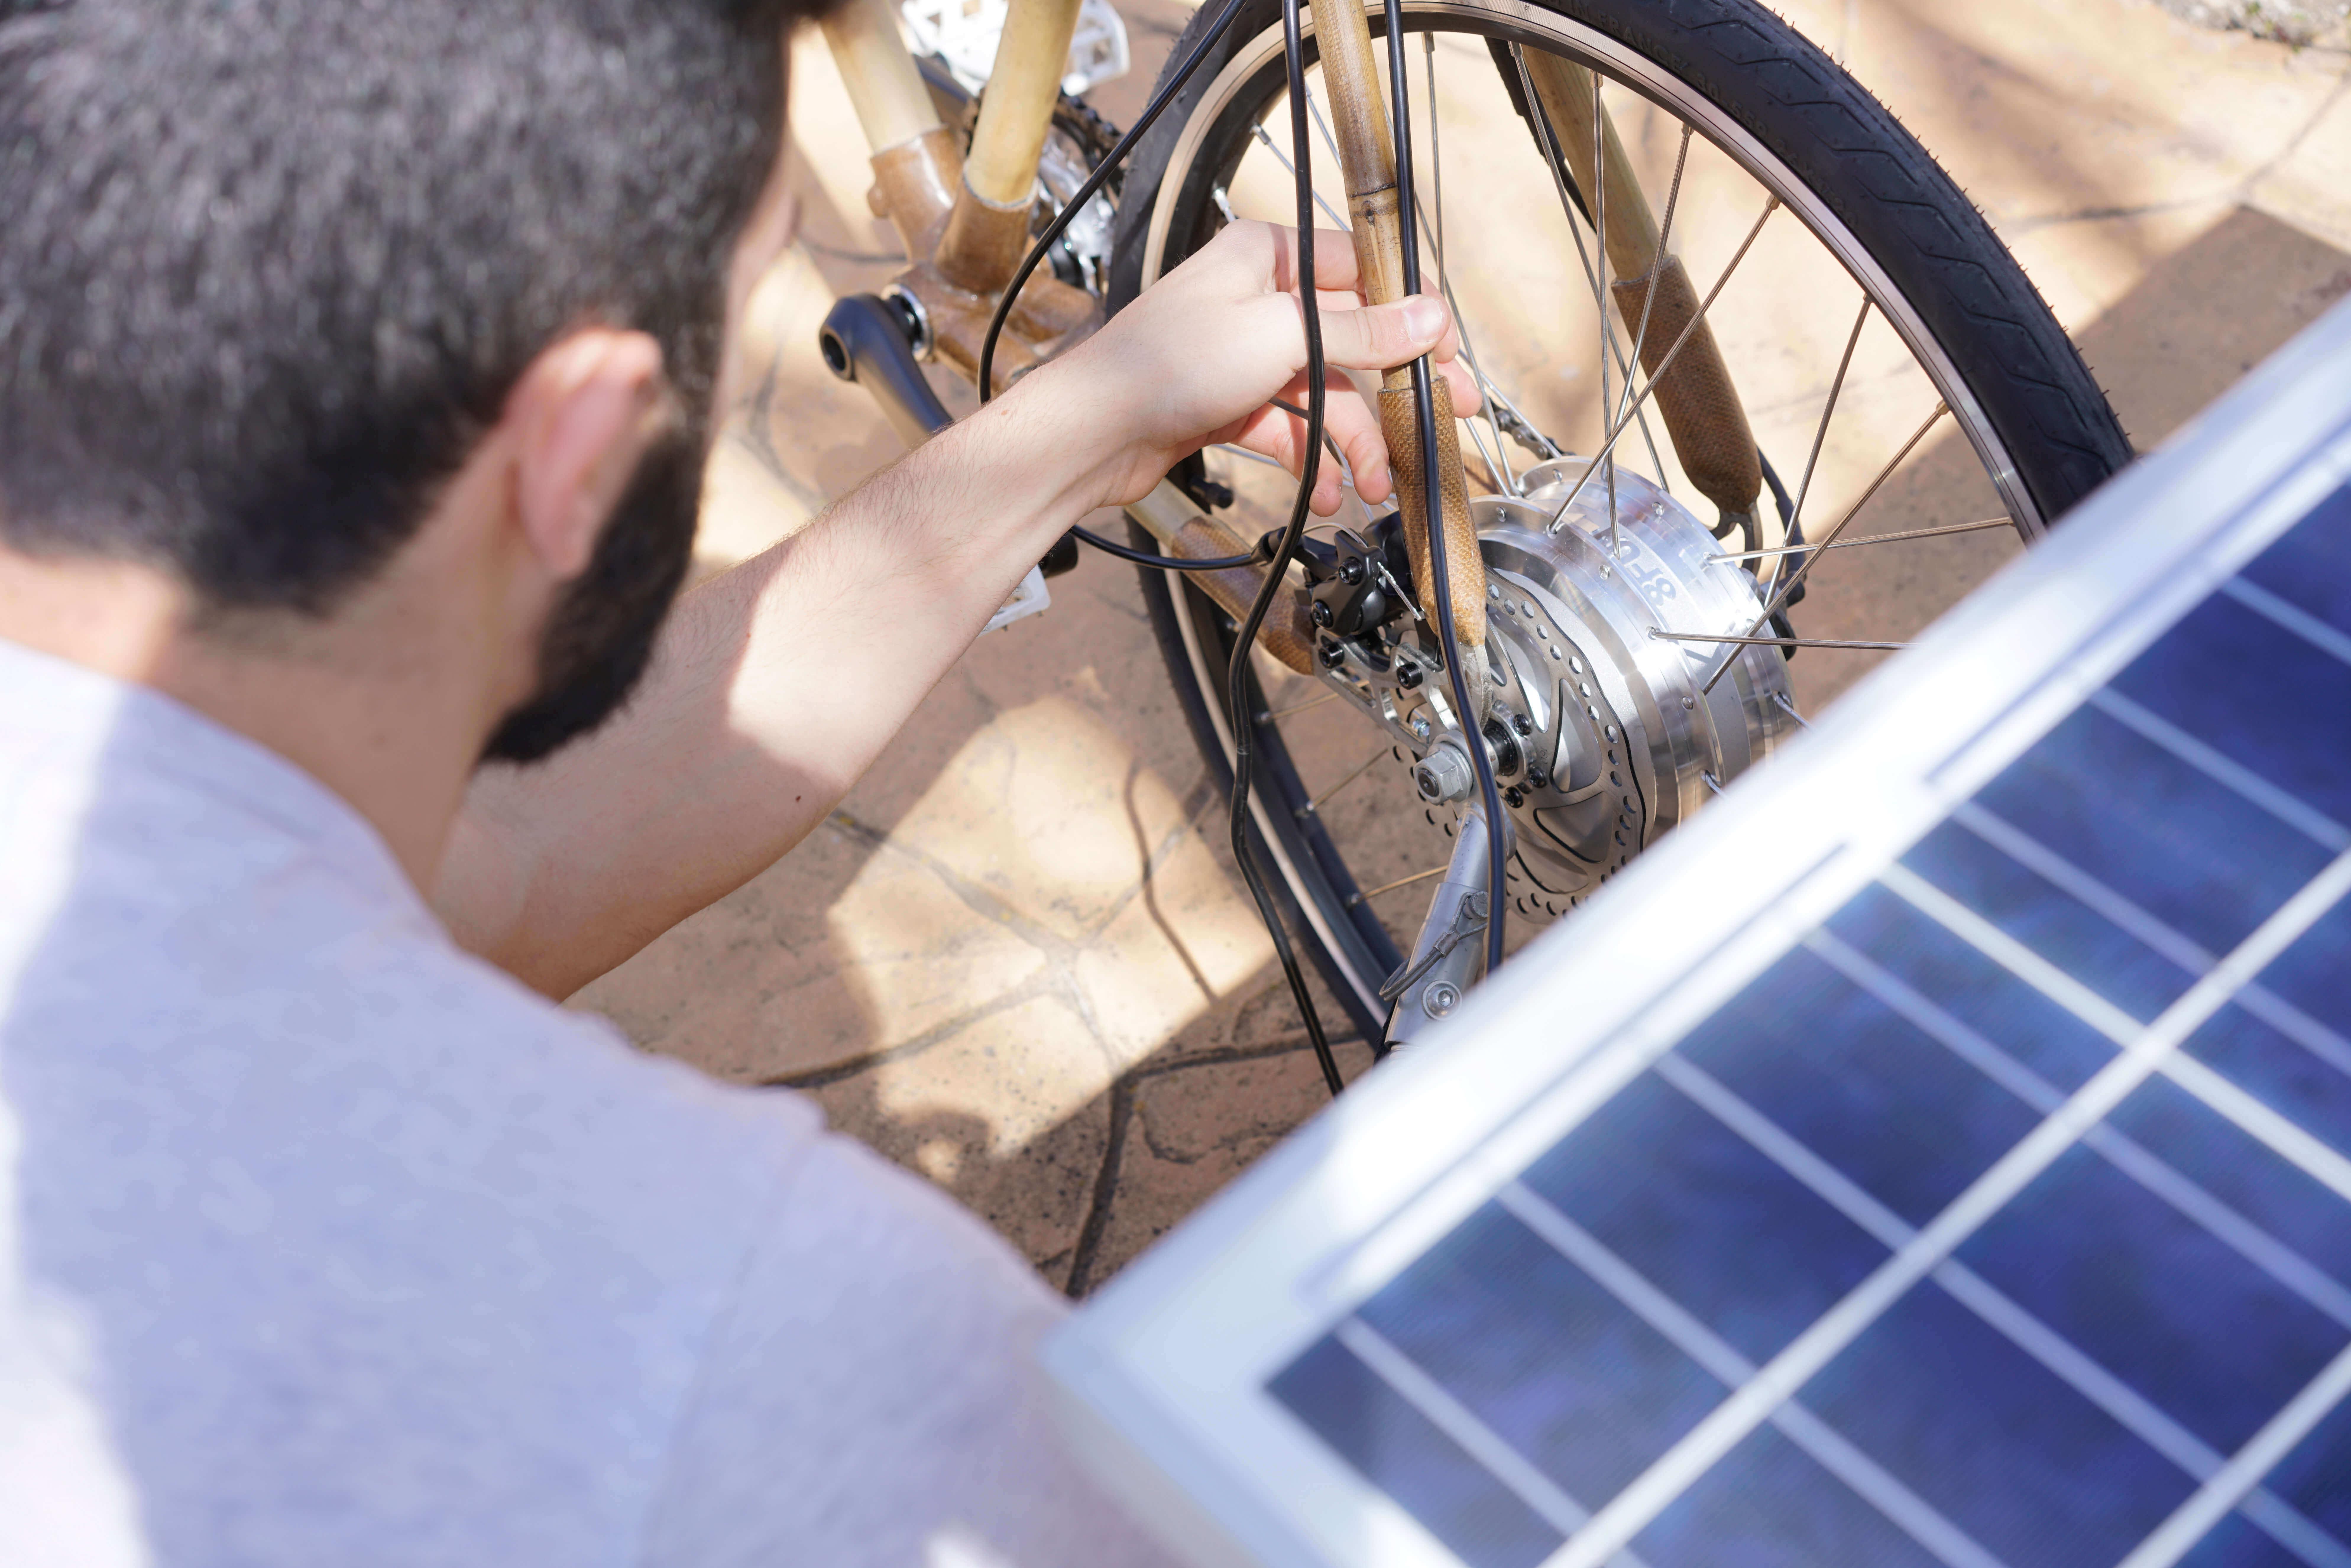 componentes-bicicleta-solar-1.jpg